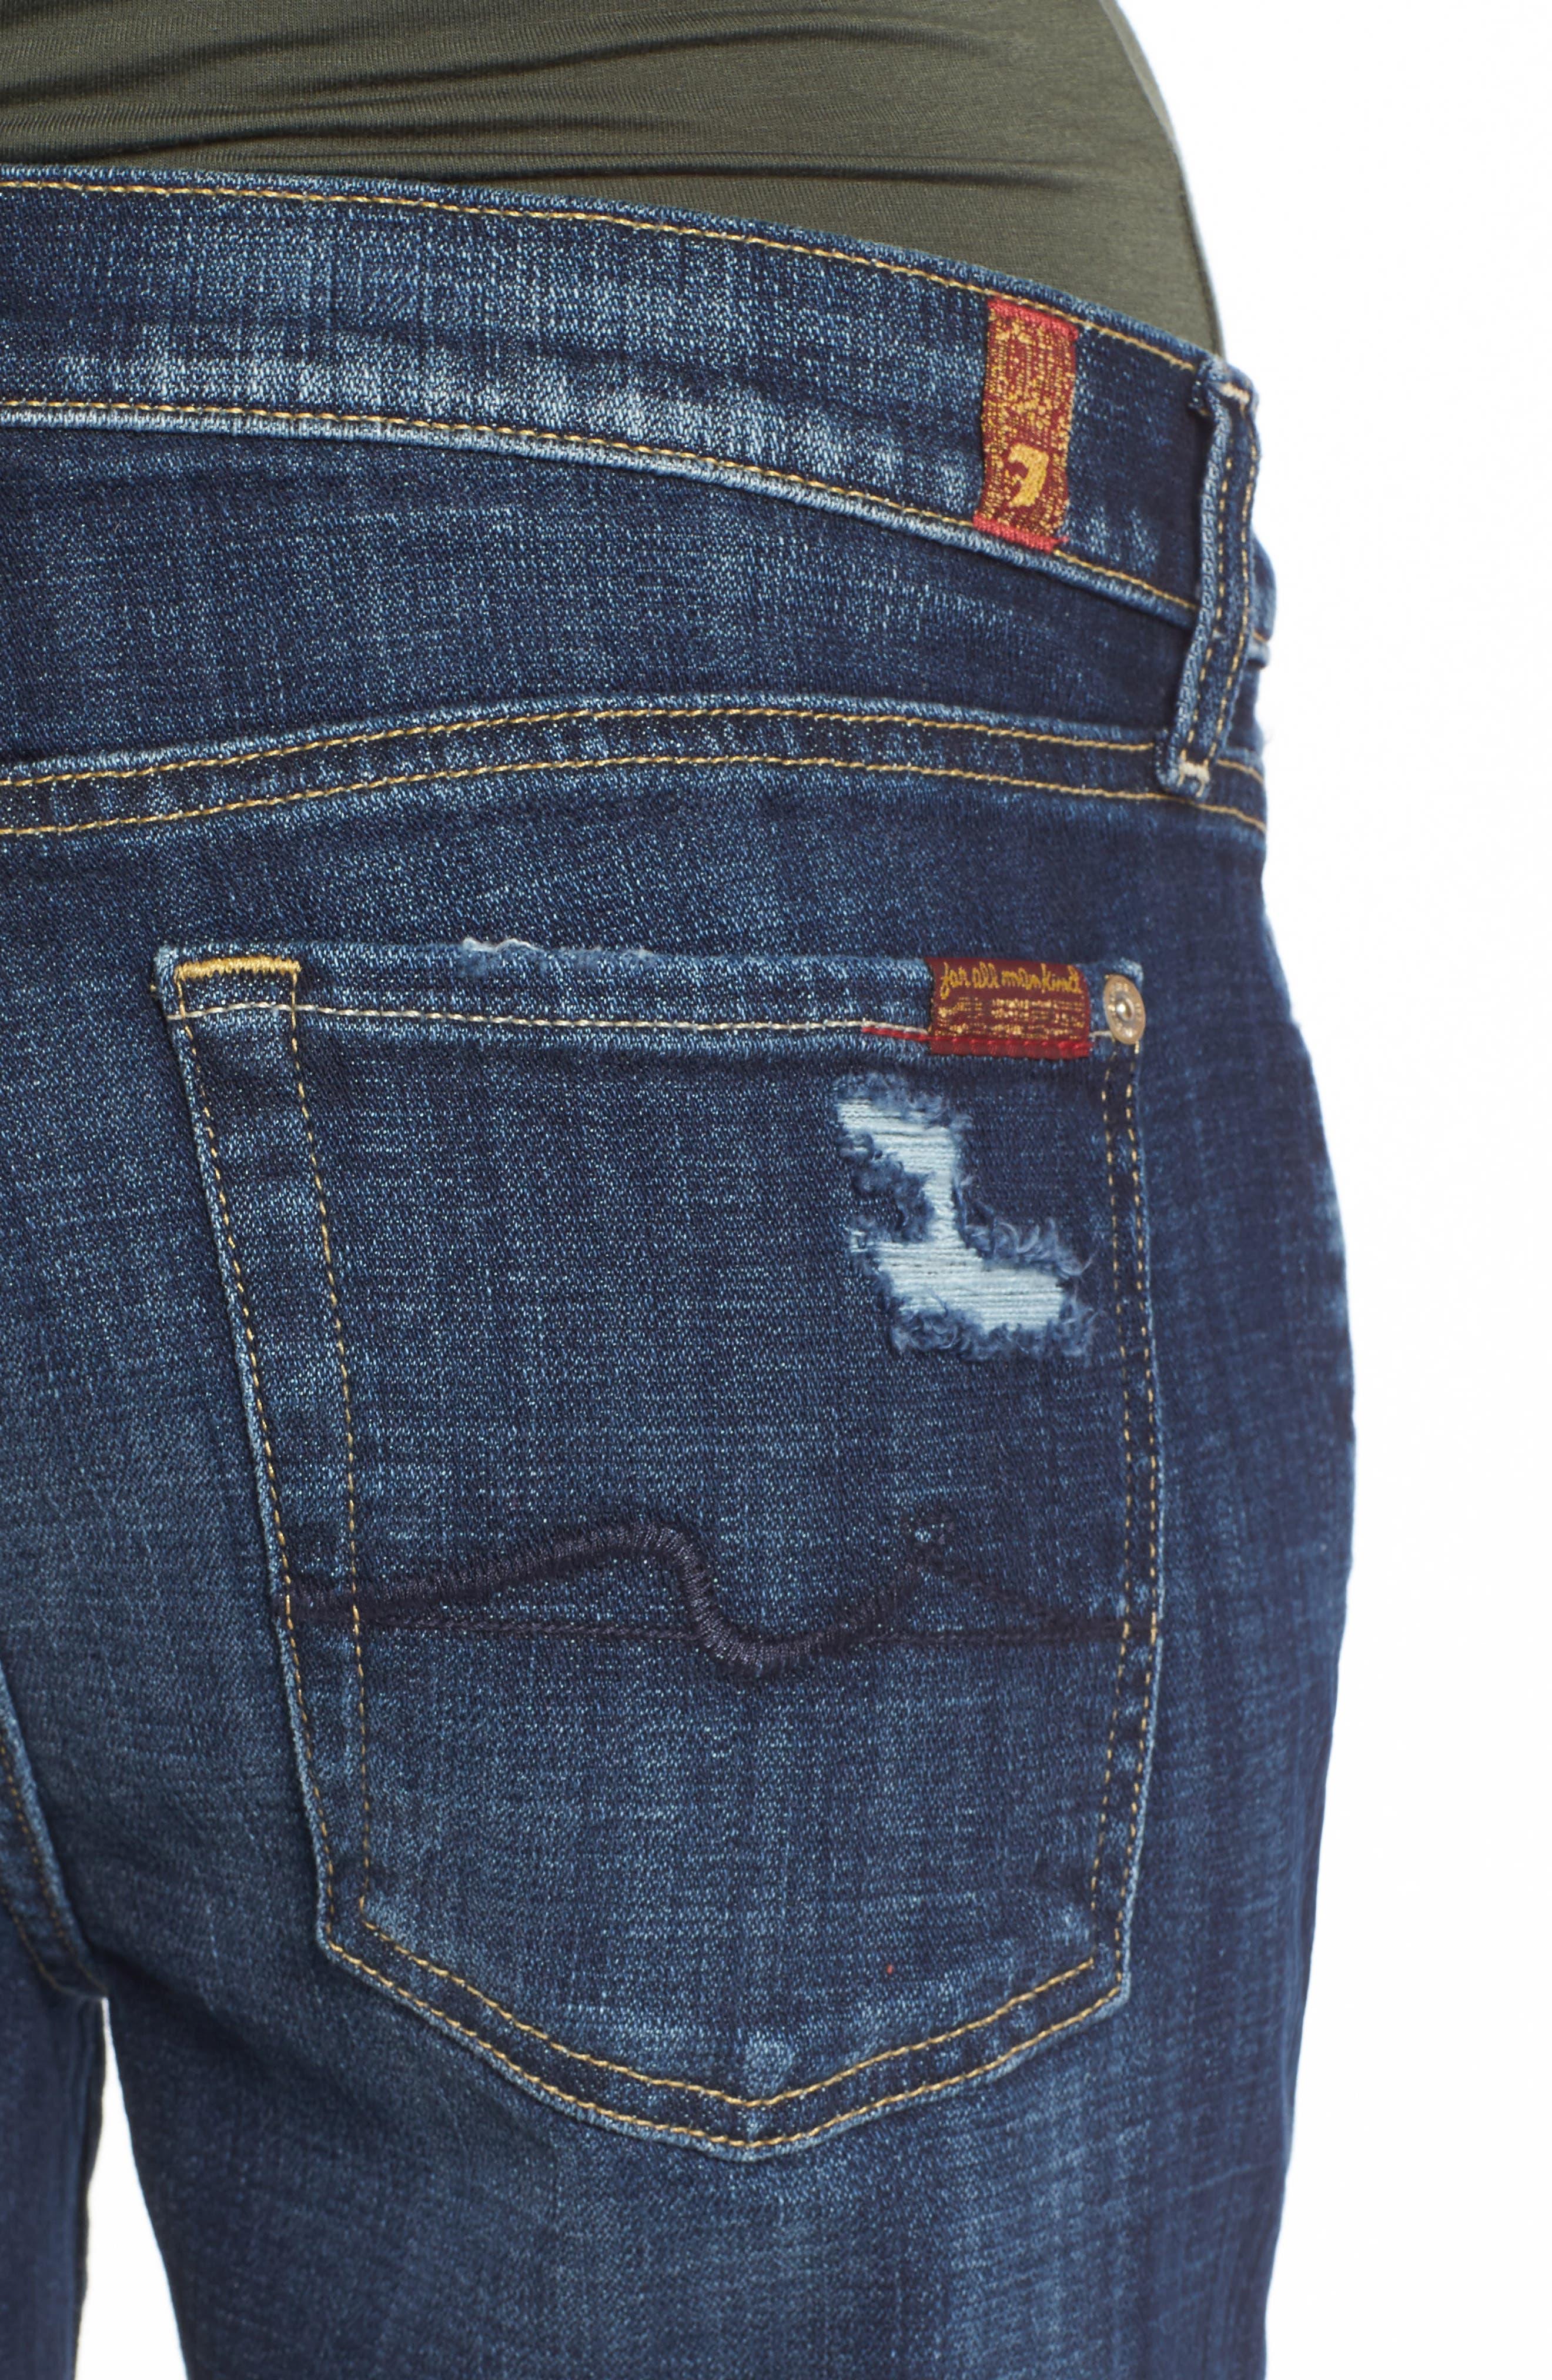 Josefina Boyfriend Jeans,                             Alternate thumbnail 6, color,                             Majestic Broken Twill